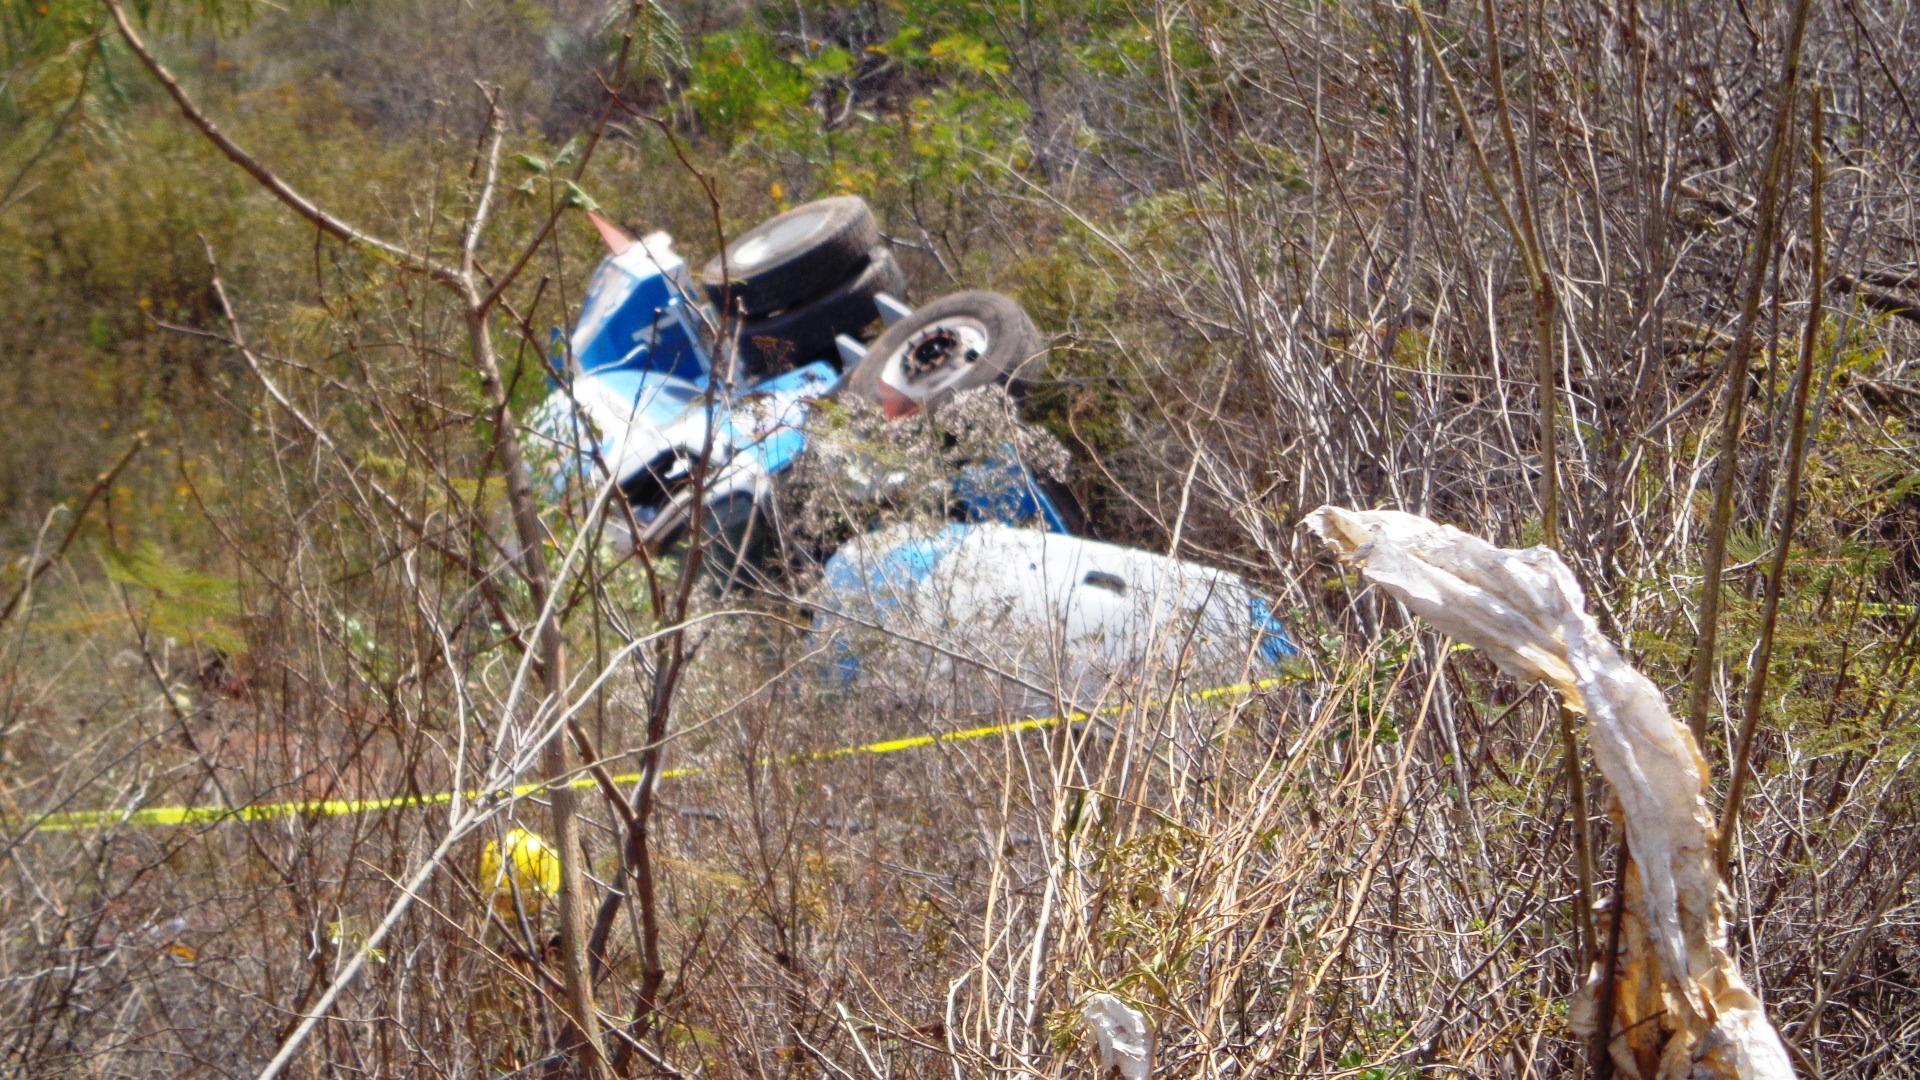 Trágico accidente deja un muerto en Huajuapan - e-oaxaca Periódico Digital de Oaxaca